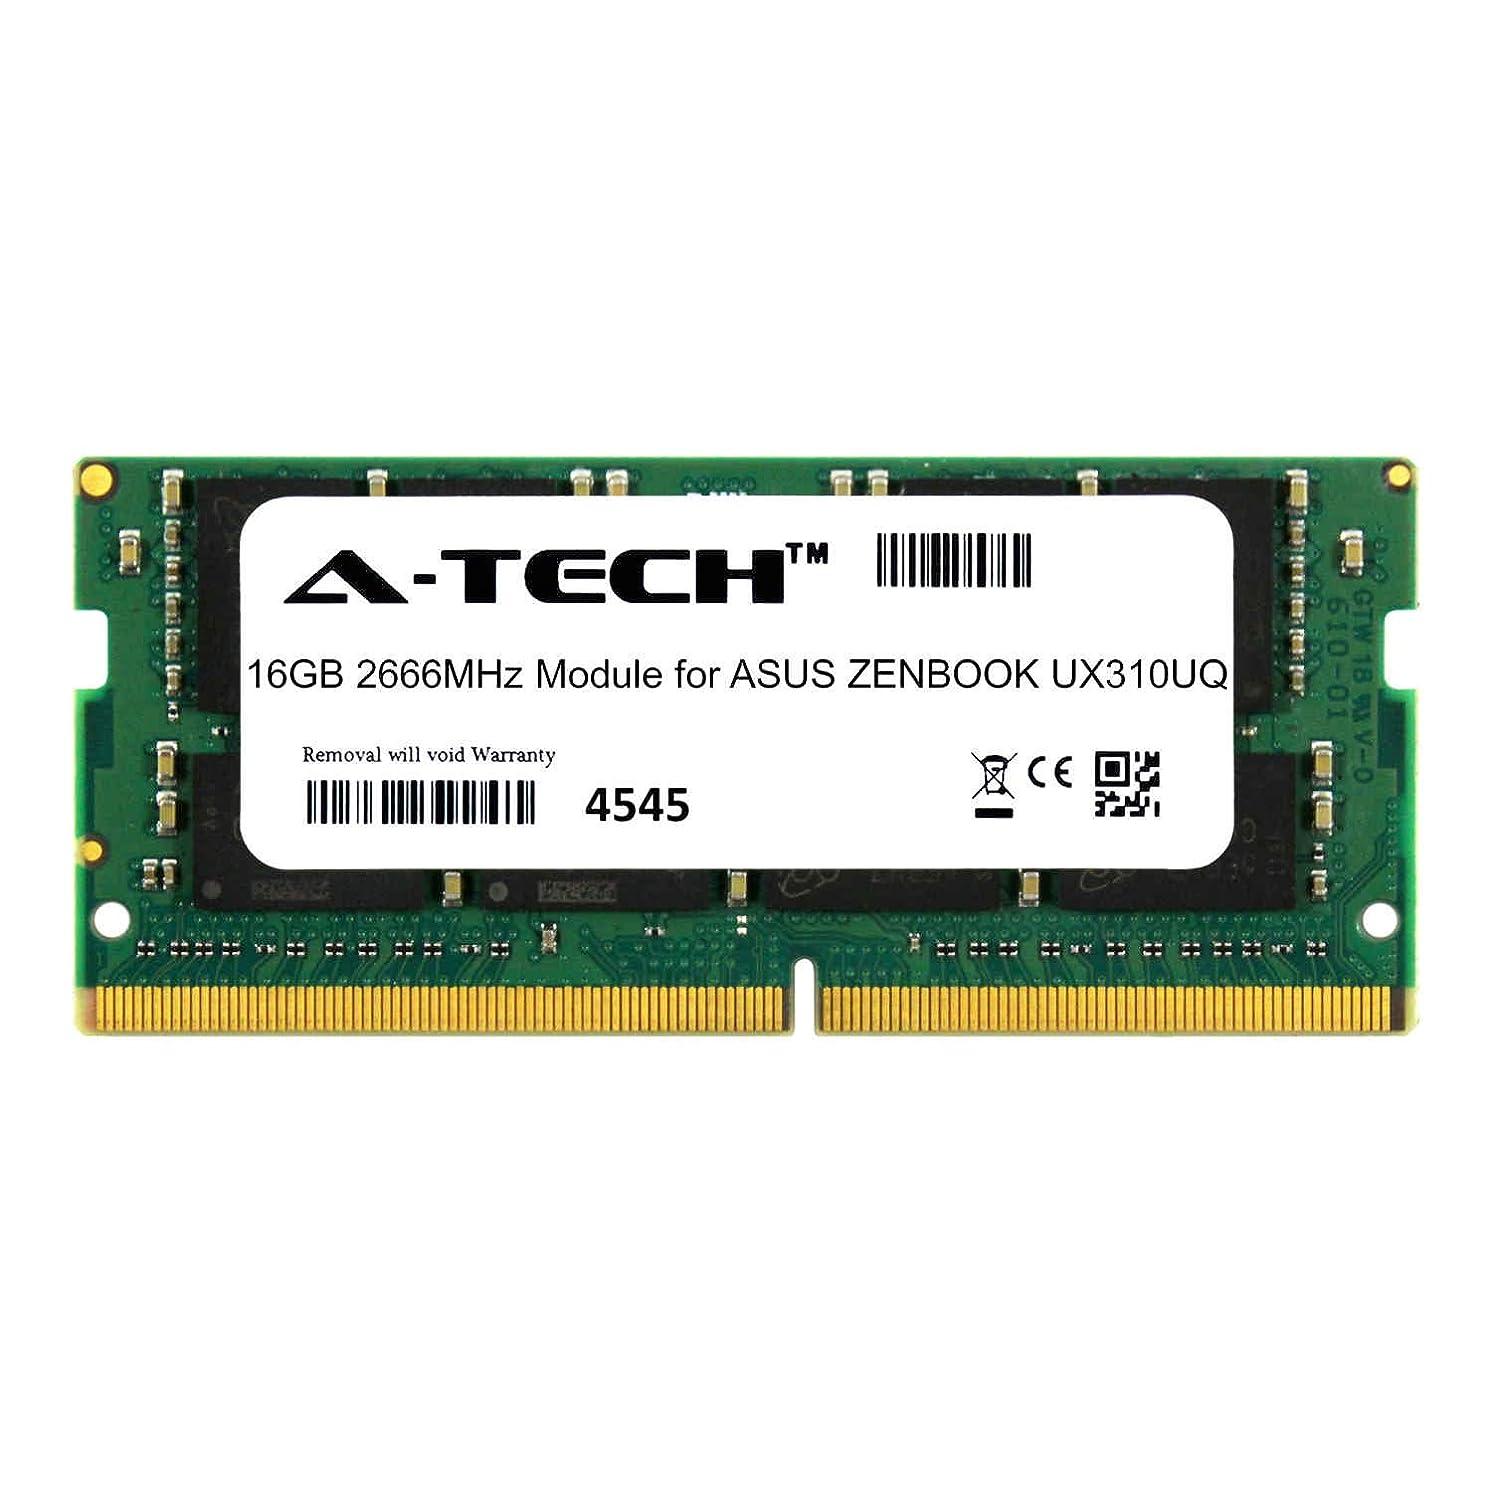 A-Tech 16GB Module for ASUS ZENBOOK UX310UQ Laptop & Notebook Compatible DDR4 2666Mhz Memory Ram (ATMS361013A25832X1)